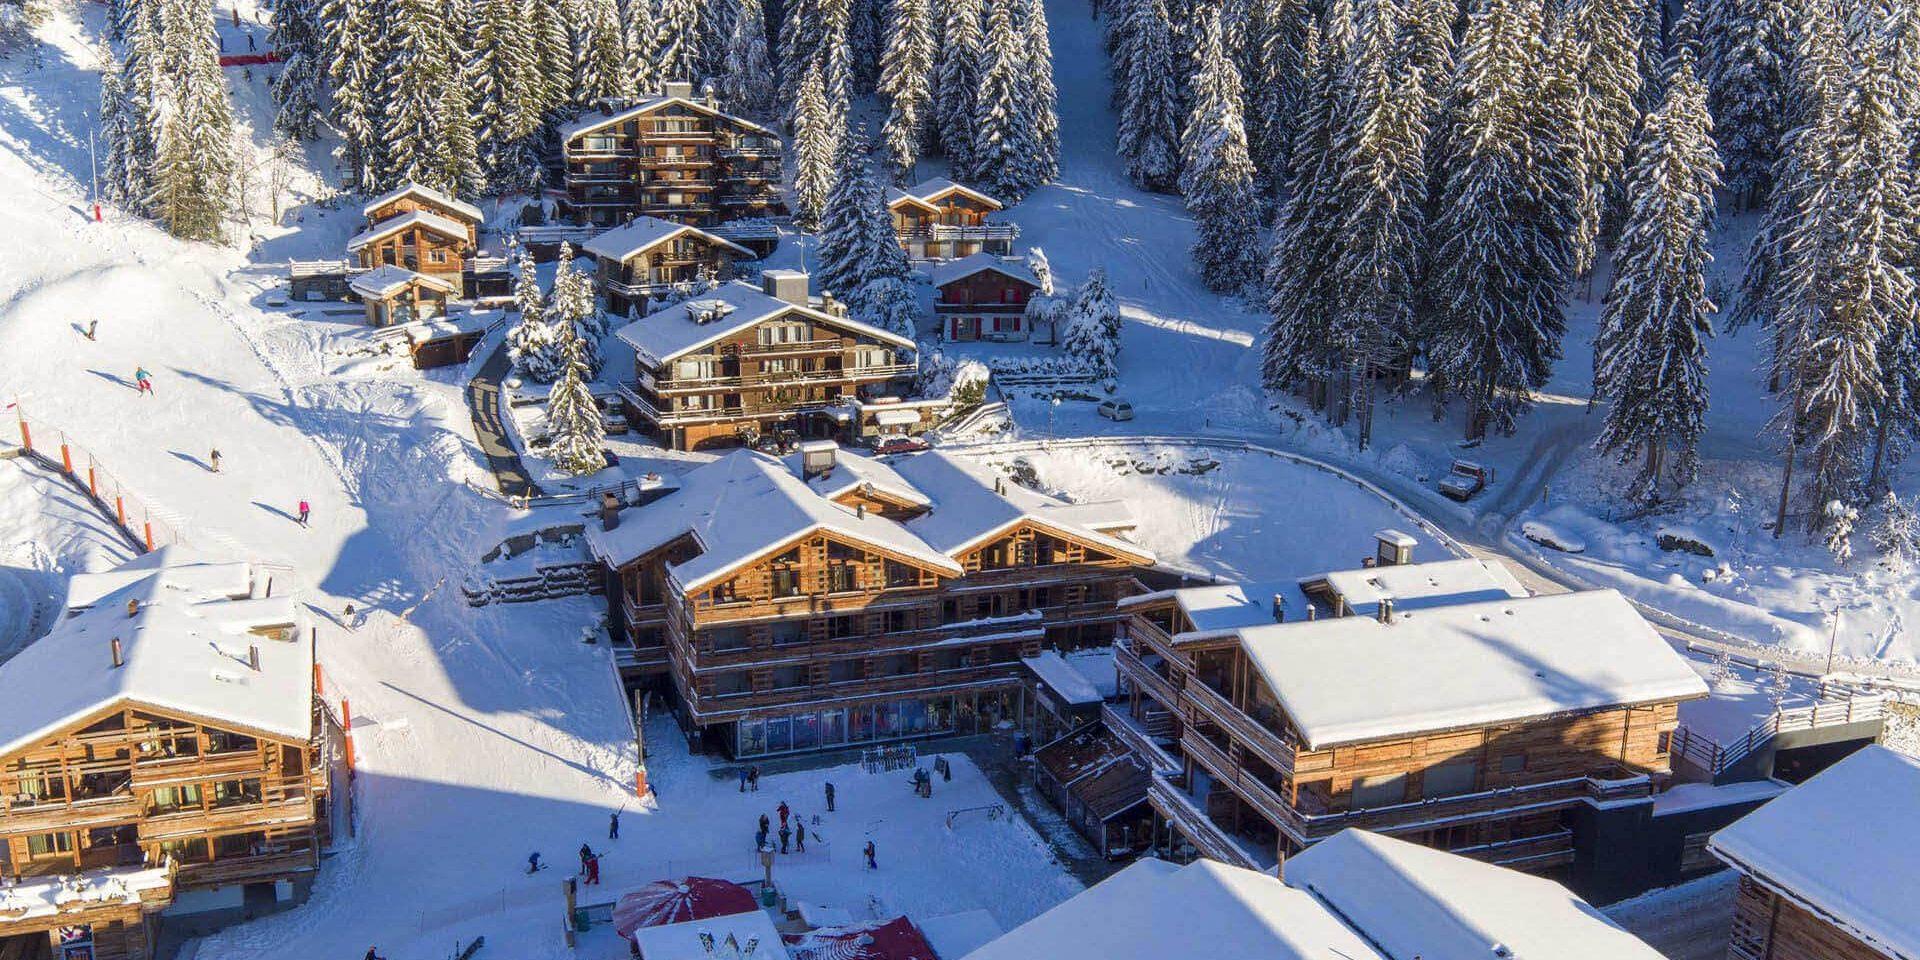 Appartement Place Blanche Verbier Les 4 Vallees Zwitserland wintersport skivakantie luxe ligging appartement sneeuw bomen dorpsplein